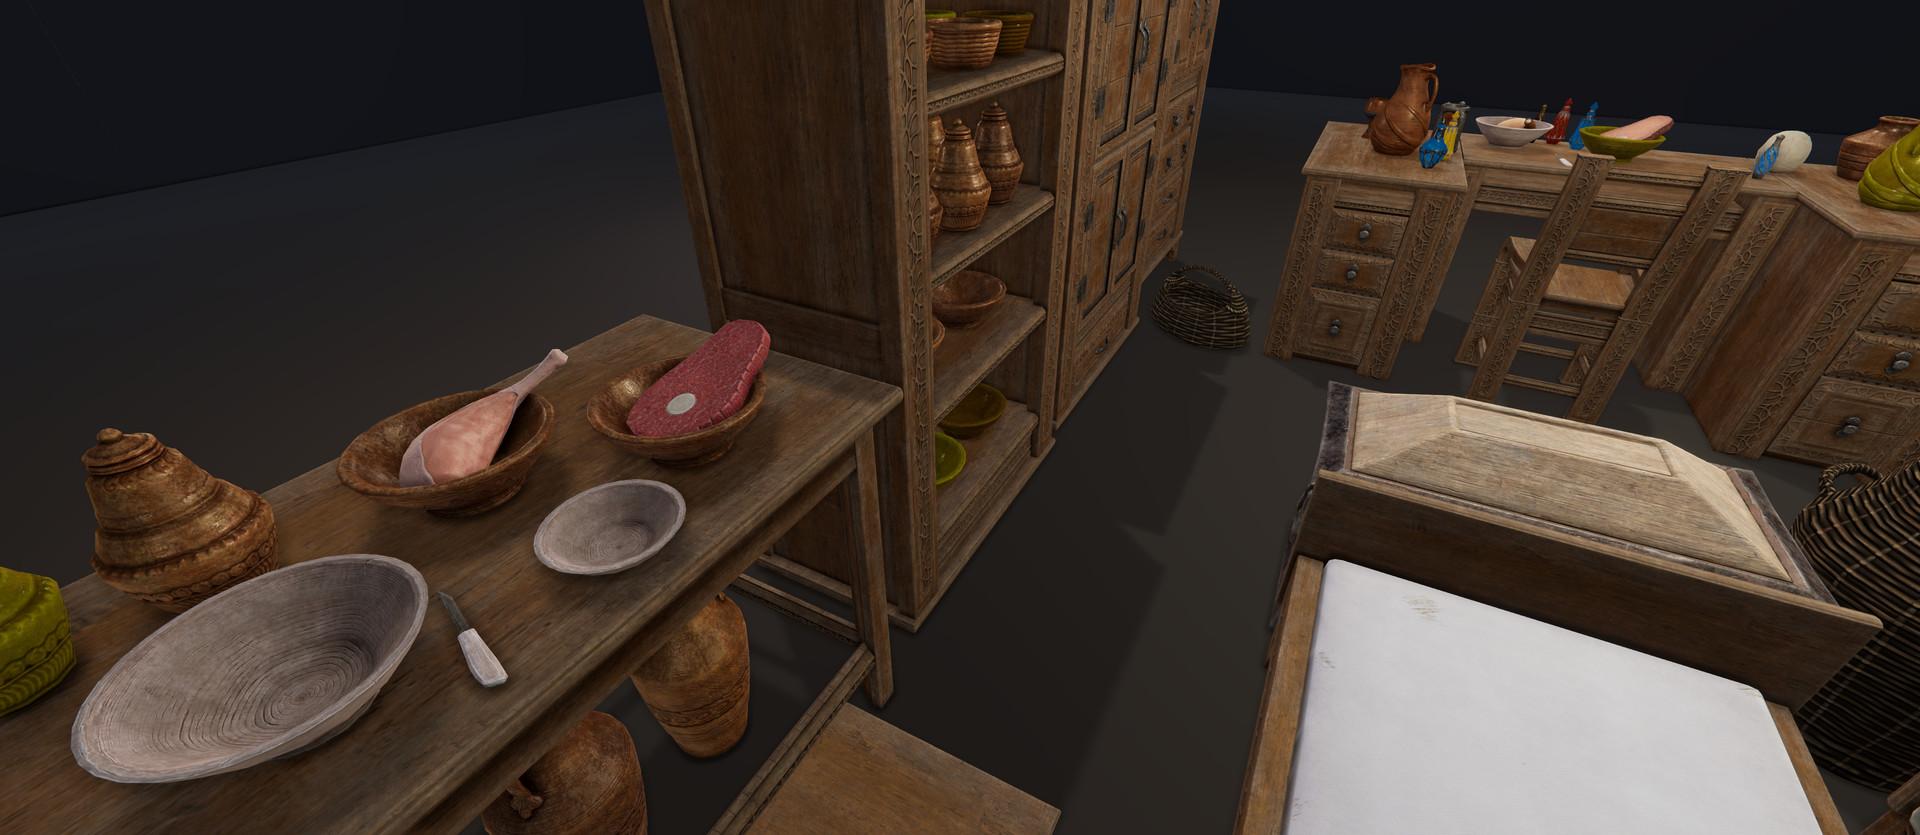 Fantasy furniture/props